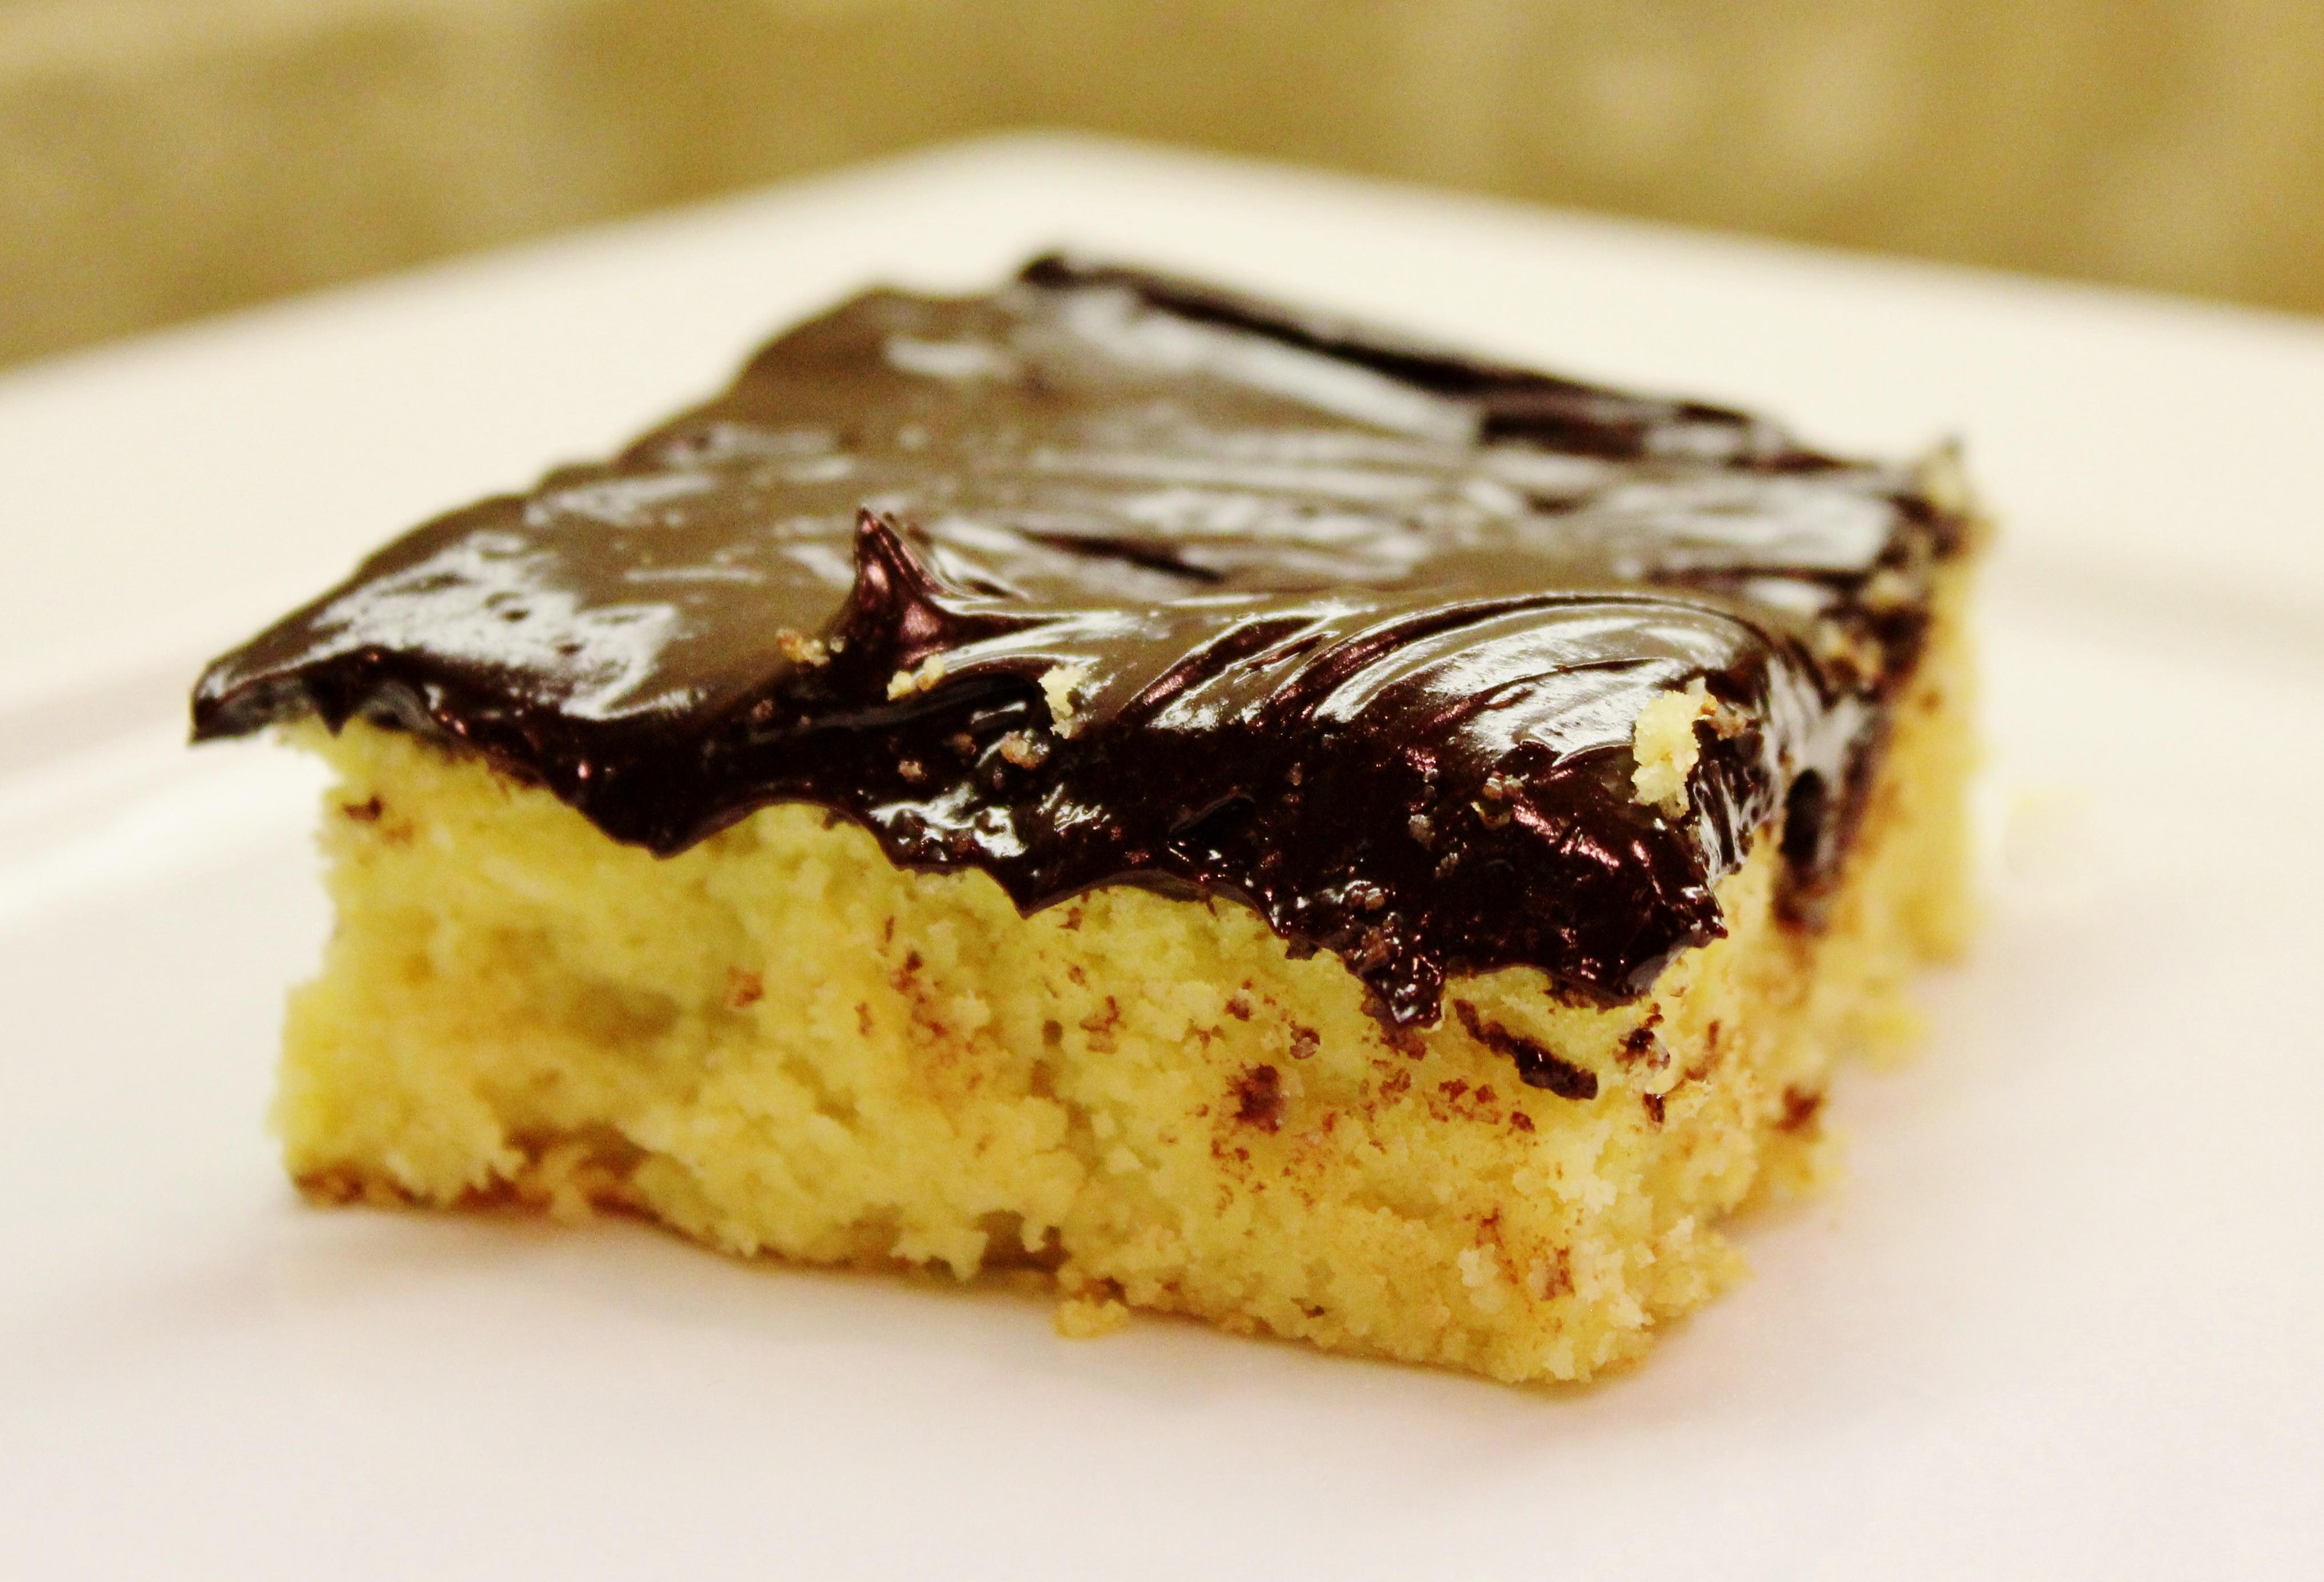 Picture of Whipped Dark Chocolate Ganache